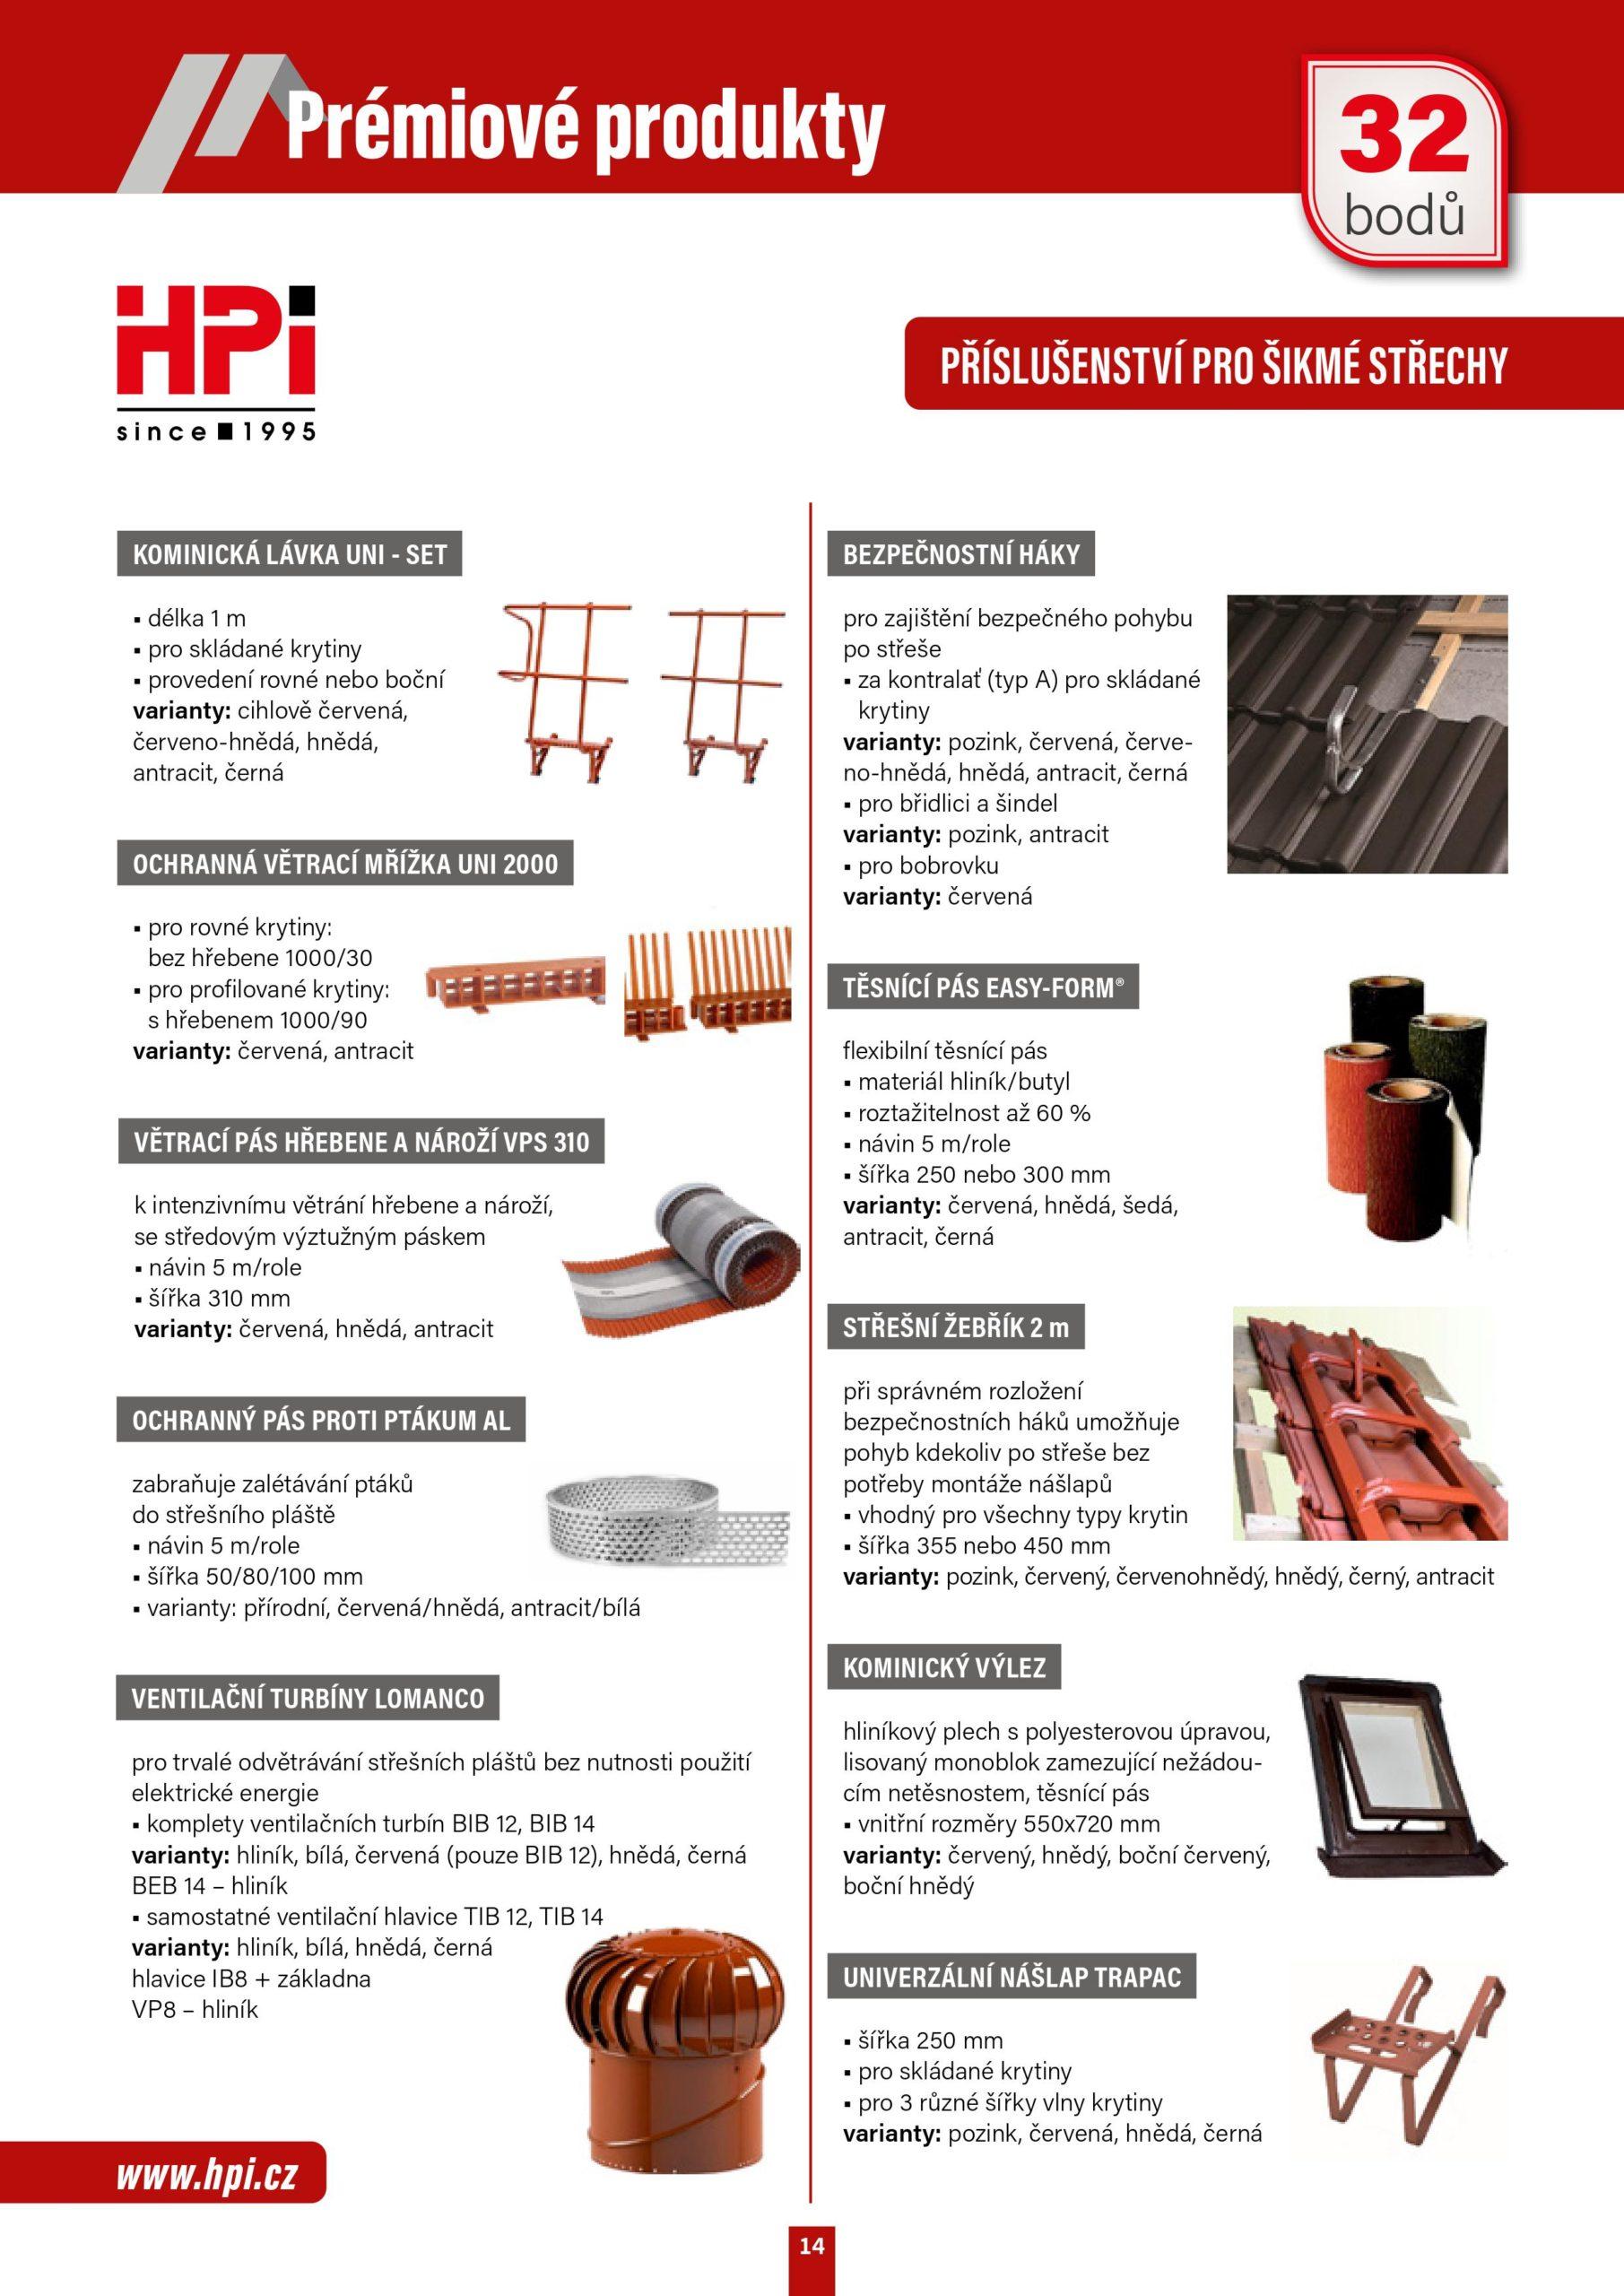 Stránka prémiové produkty